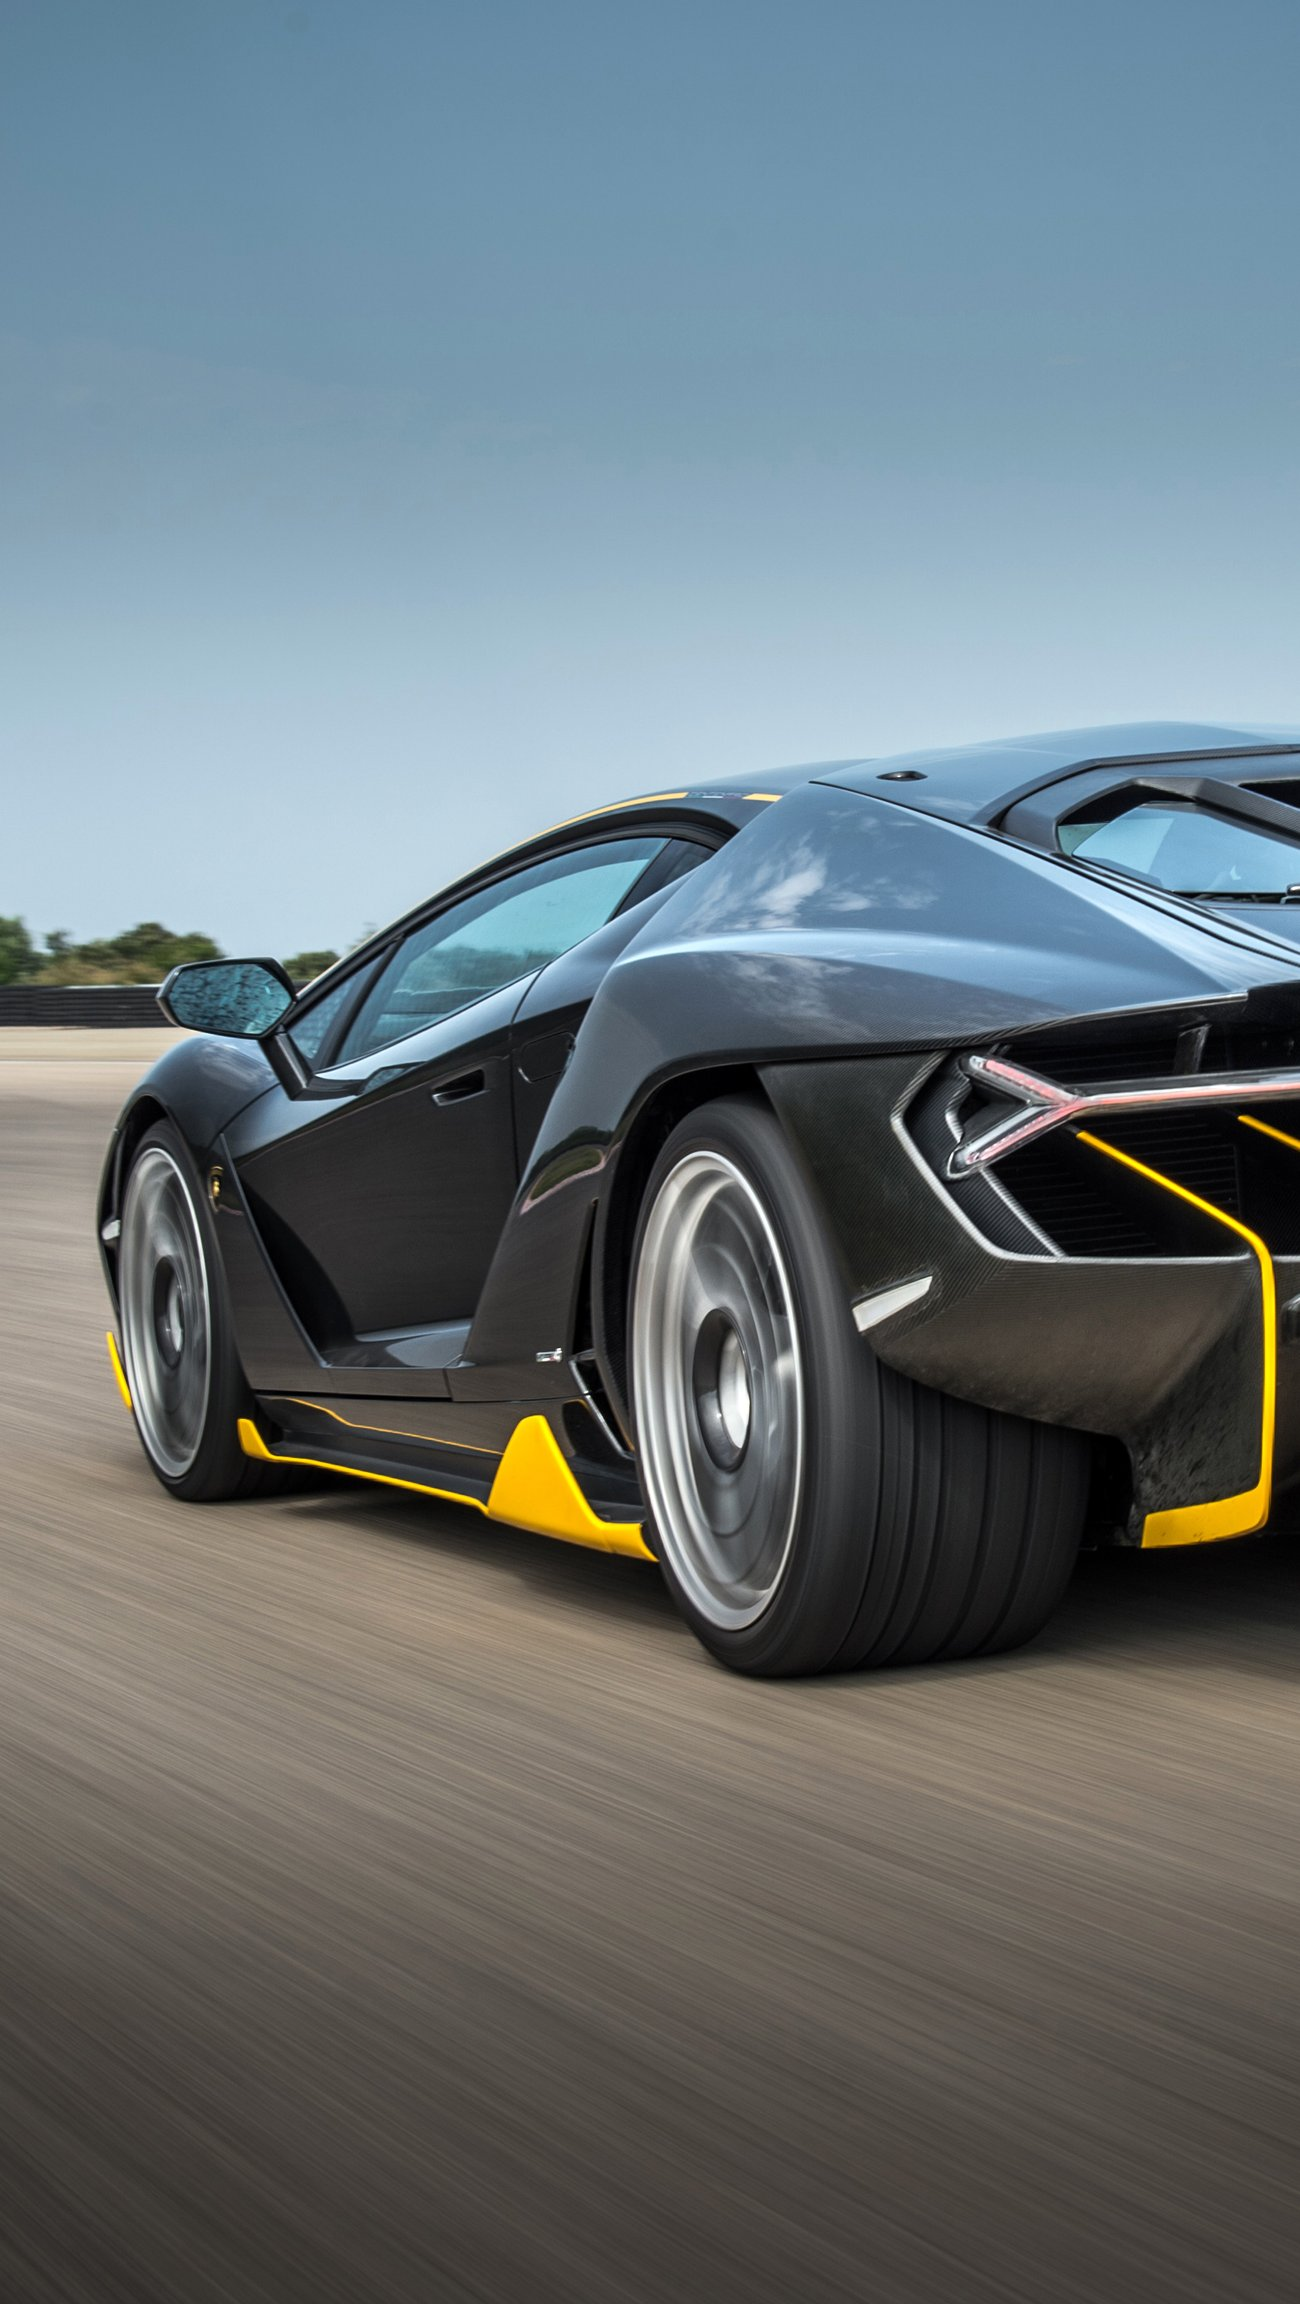 Fondos de pantalla Lamborghini Centenario Vertical